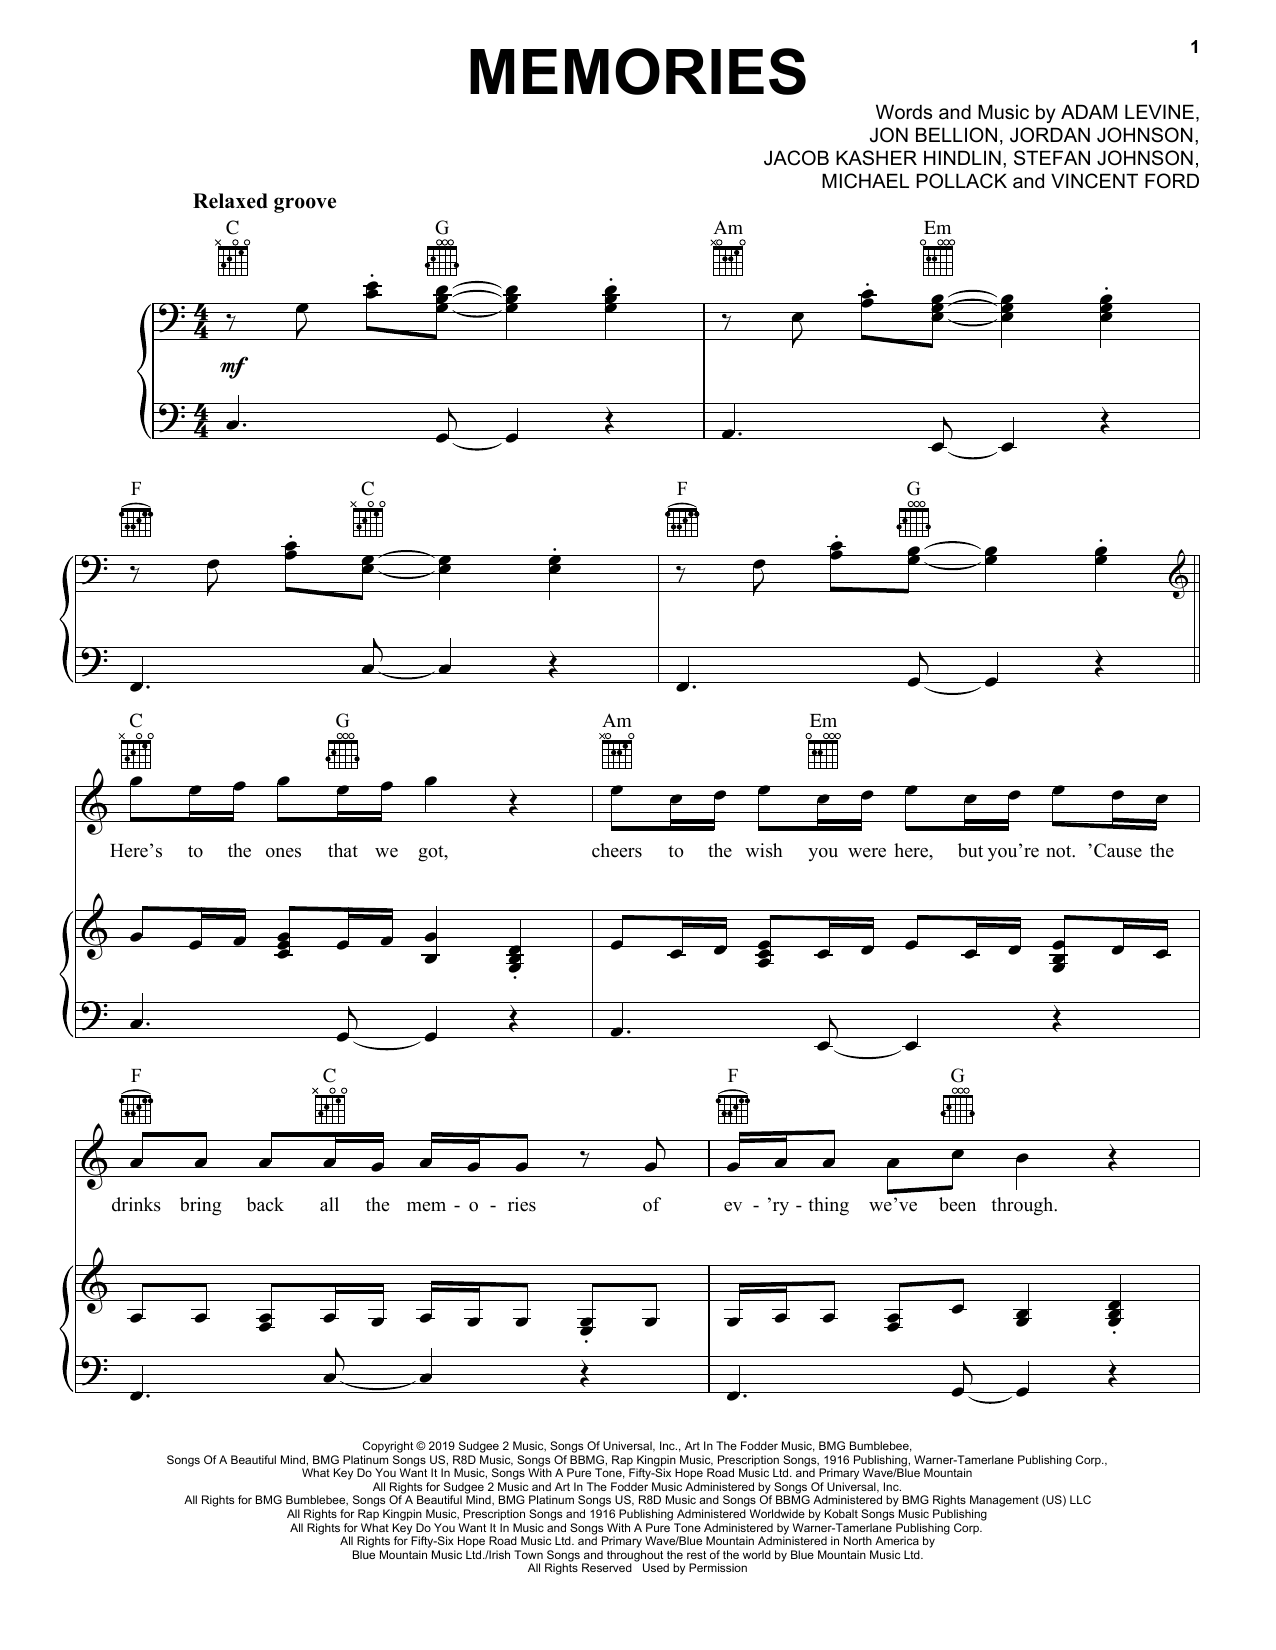 Maroon 5 Memories Sheet Music Notes Download Printable Pdf Scrore